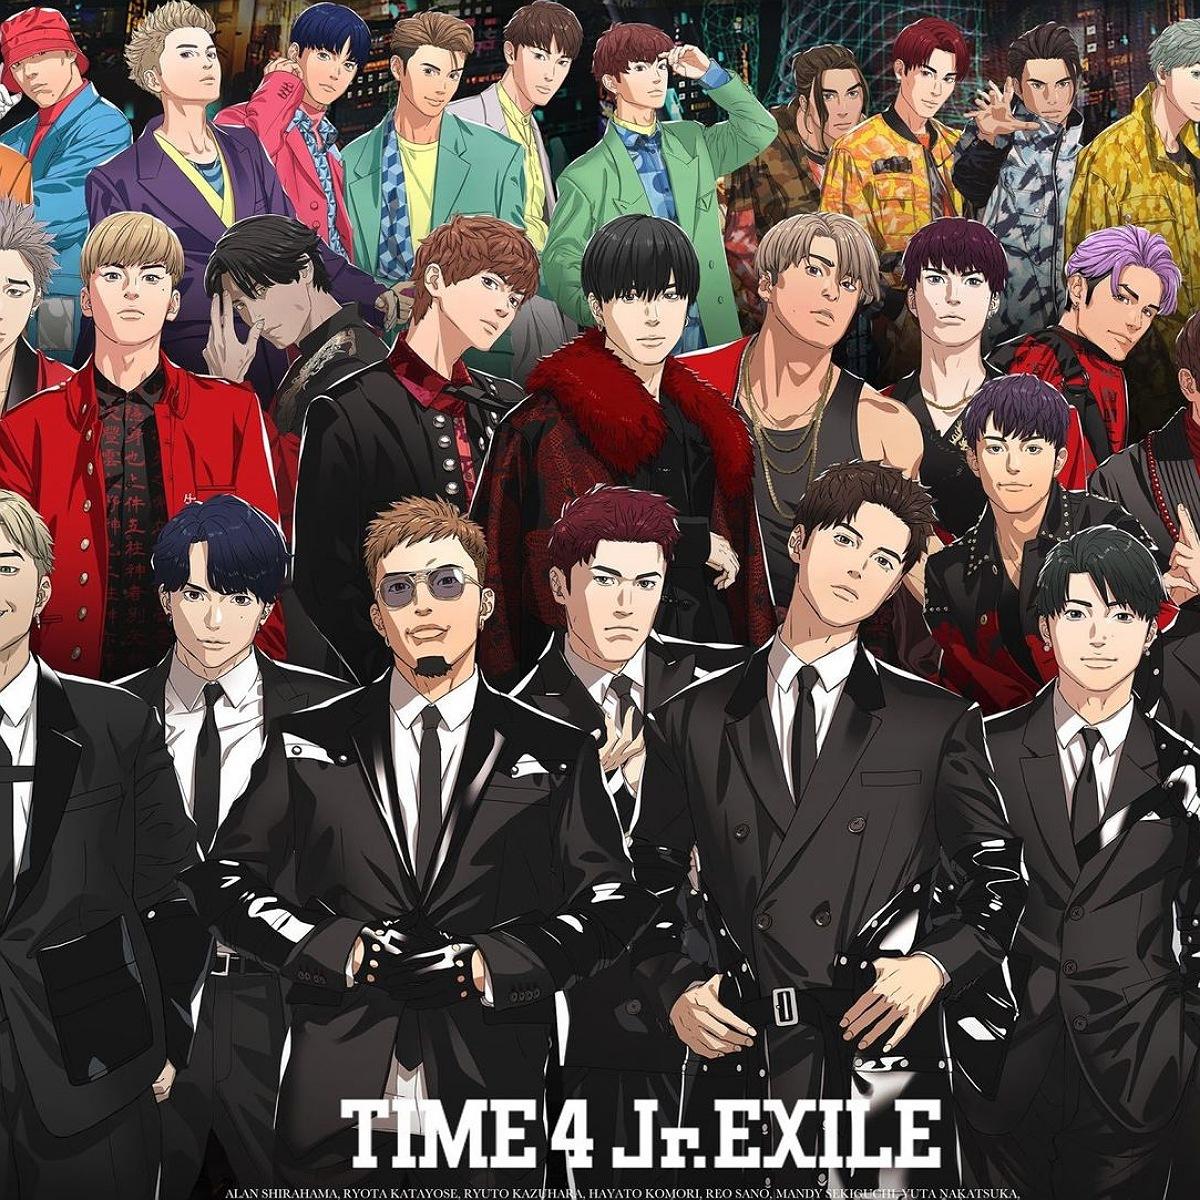 『Jr.EXILE - UNTITLED FUTURE』収録の『UNTITLED FUTURE』ジャケット